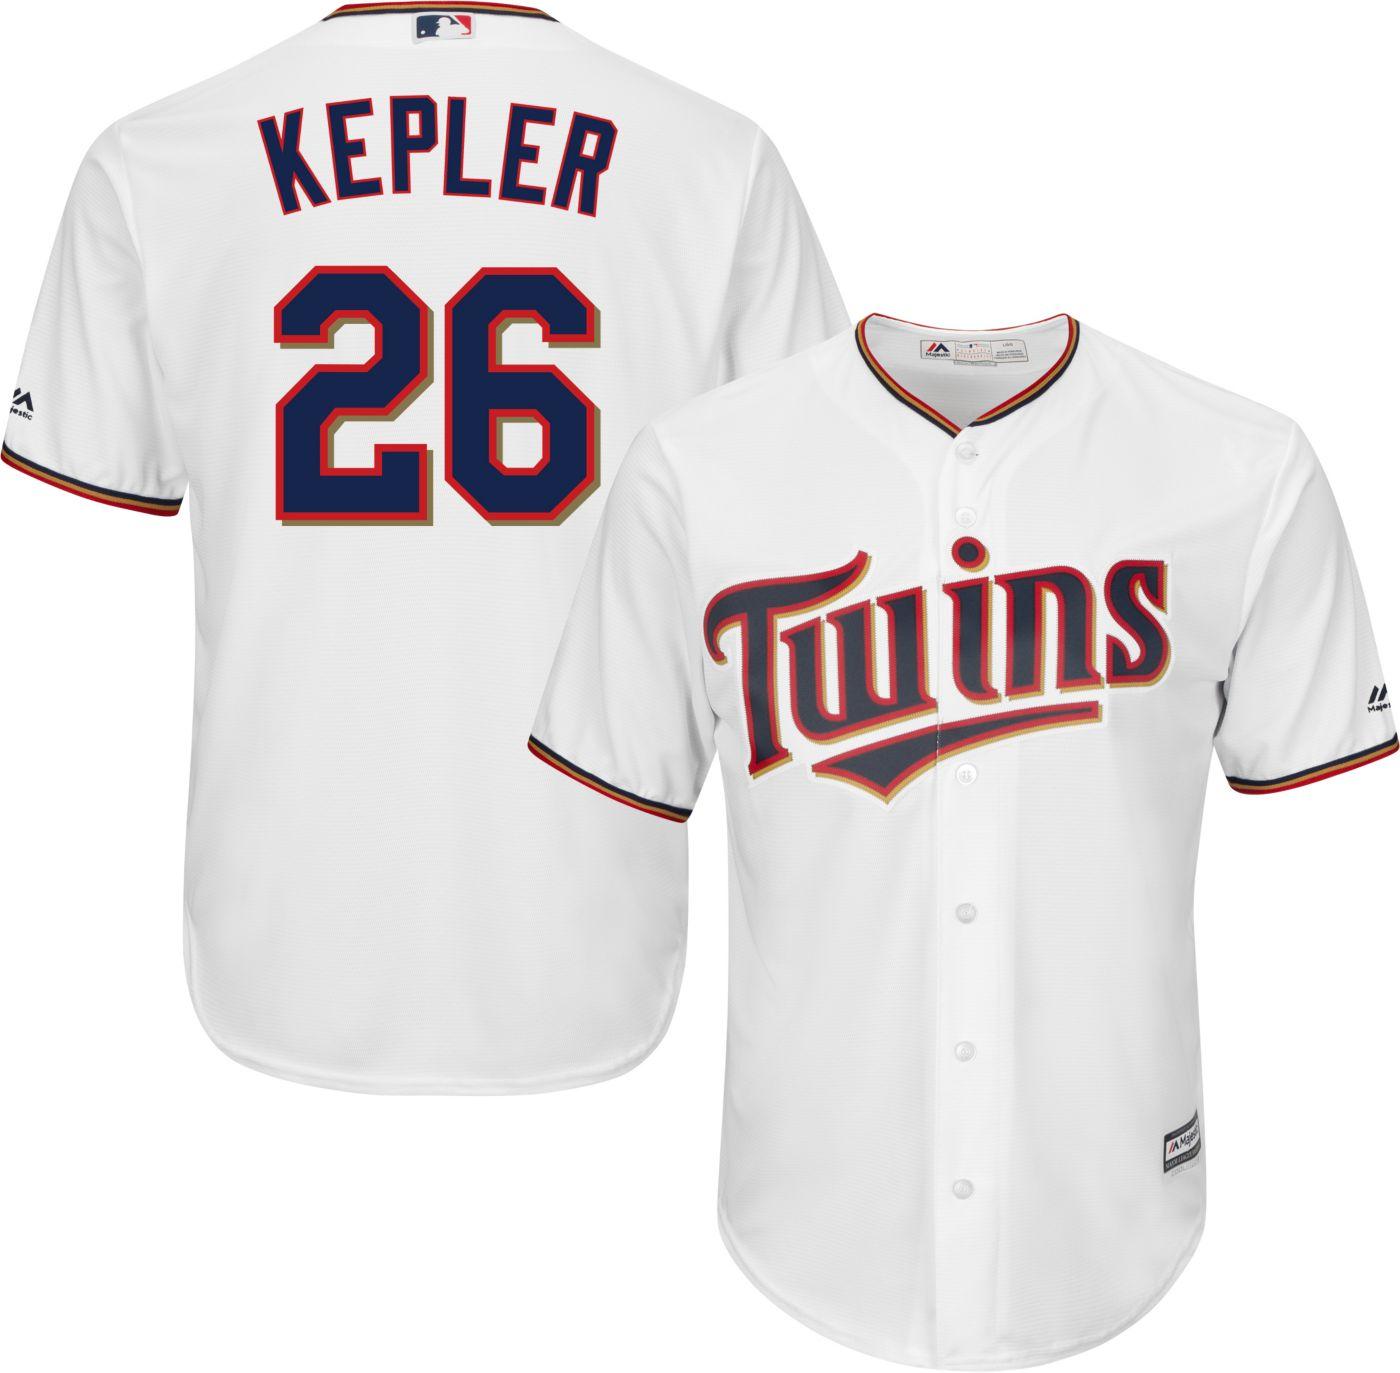 Majestic Men's Replica Minnesota Twins Max Kepler #26 Cool Base Home White Jersey